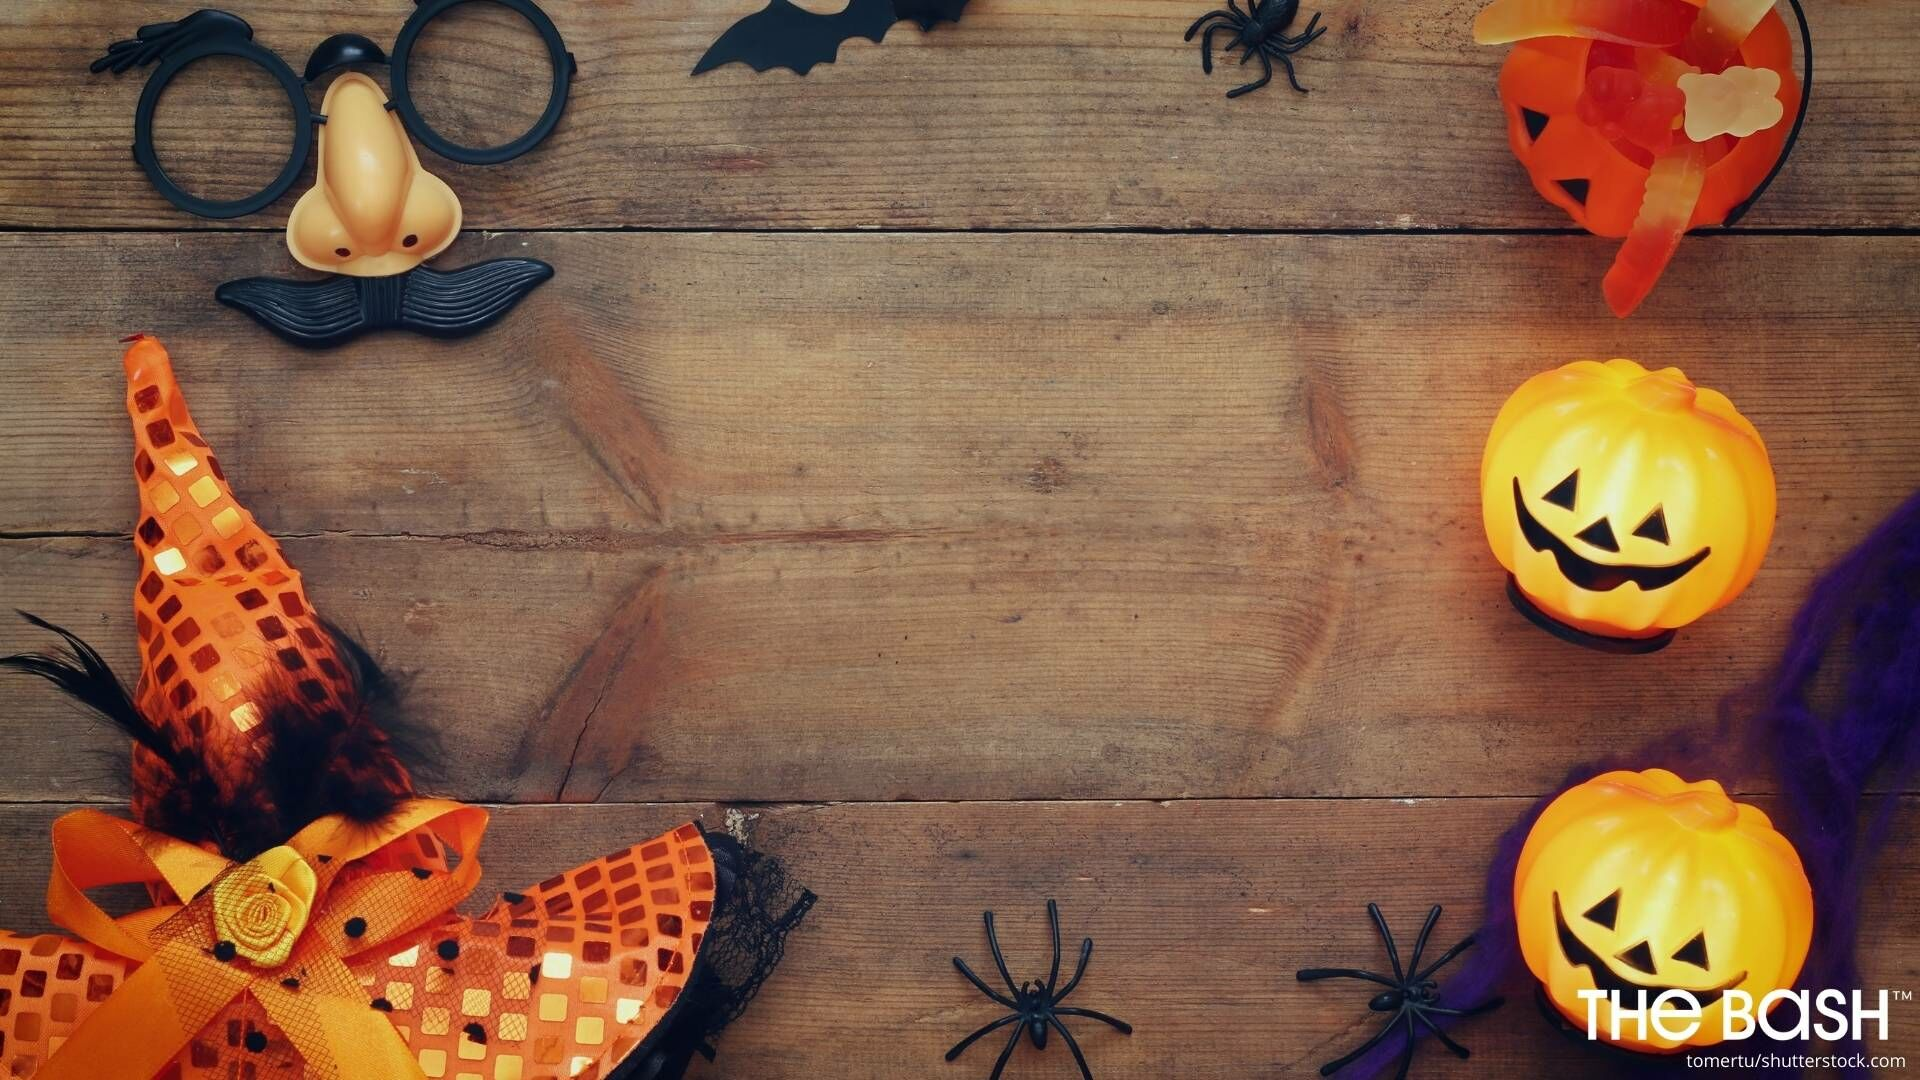 Spider Moon Ghost Skull Jack-o-Lantern Cat Pumpkin Witch Candy 24 HALLOWEEN Fortune Cookies Halloween School Party Favors Bat